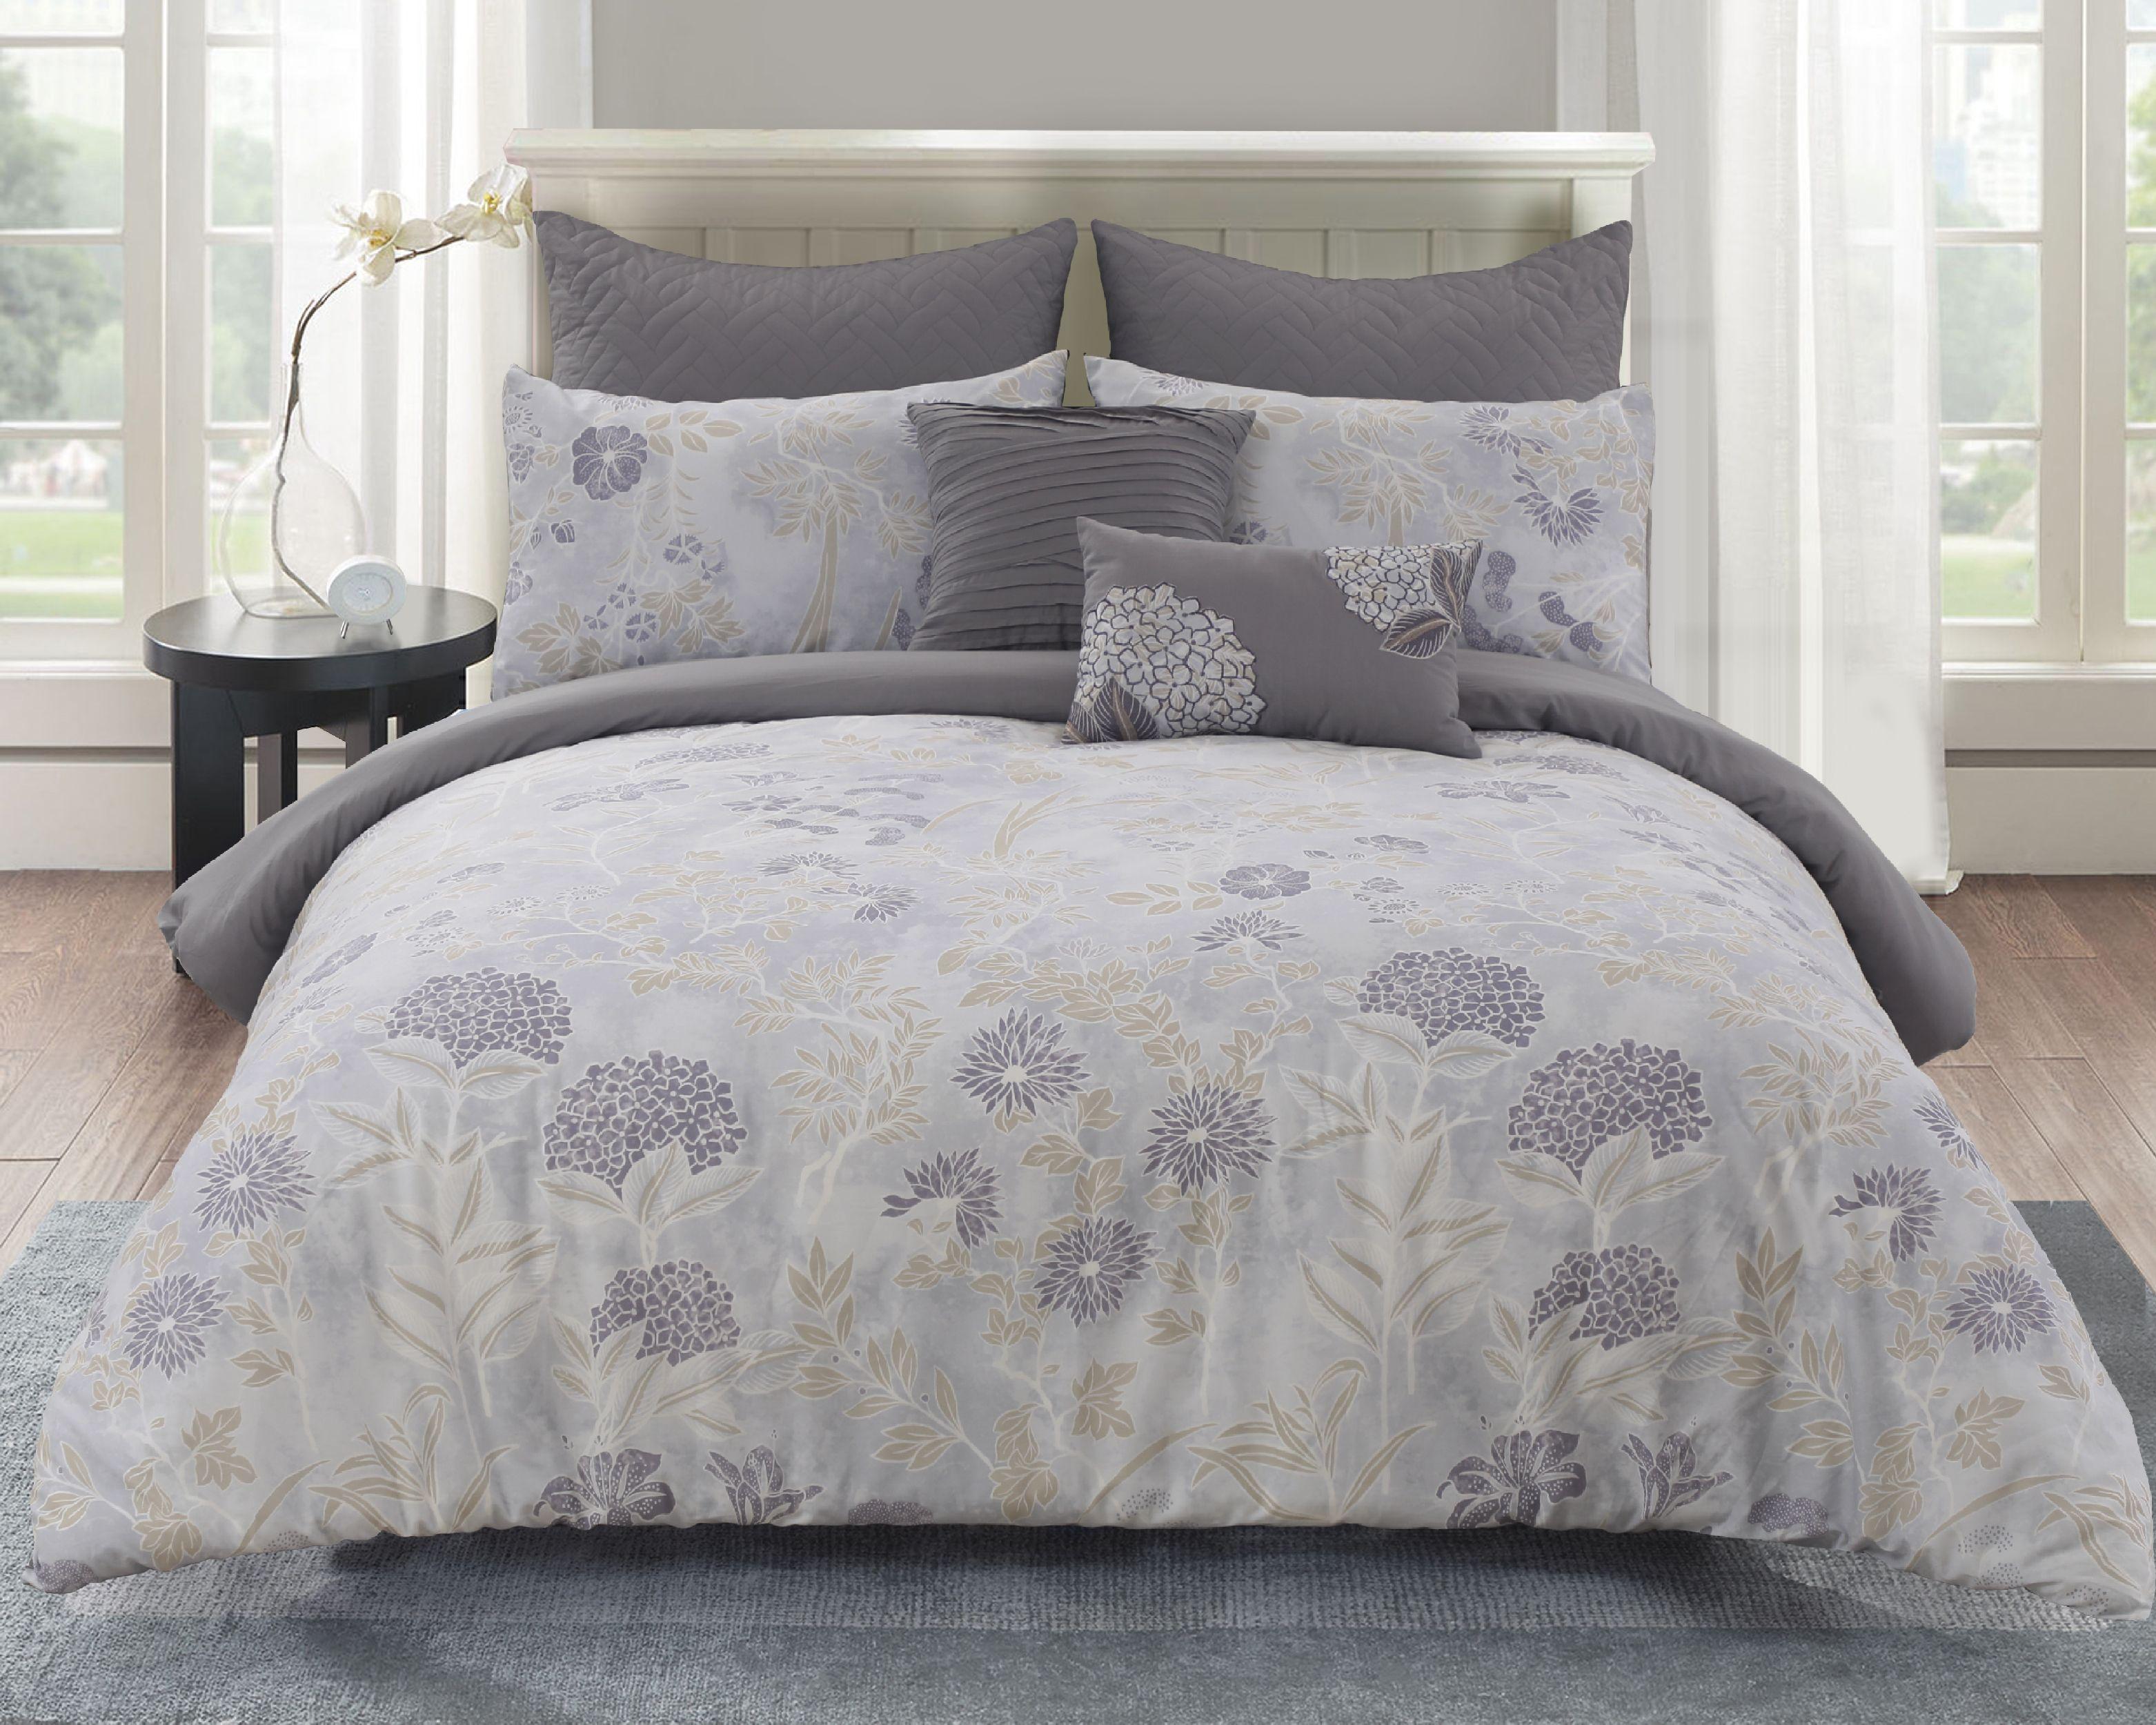 Aiko Cotton Comforter Set In Grey Cotton Comforter Set Comforter Sets King Size Comforter Sets